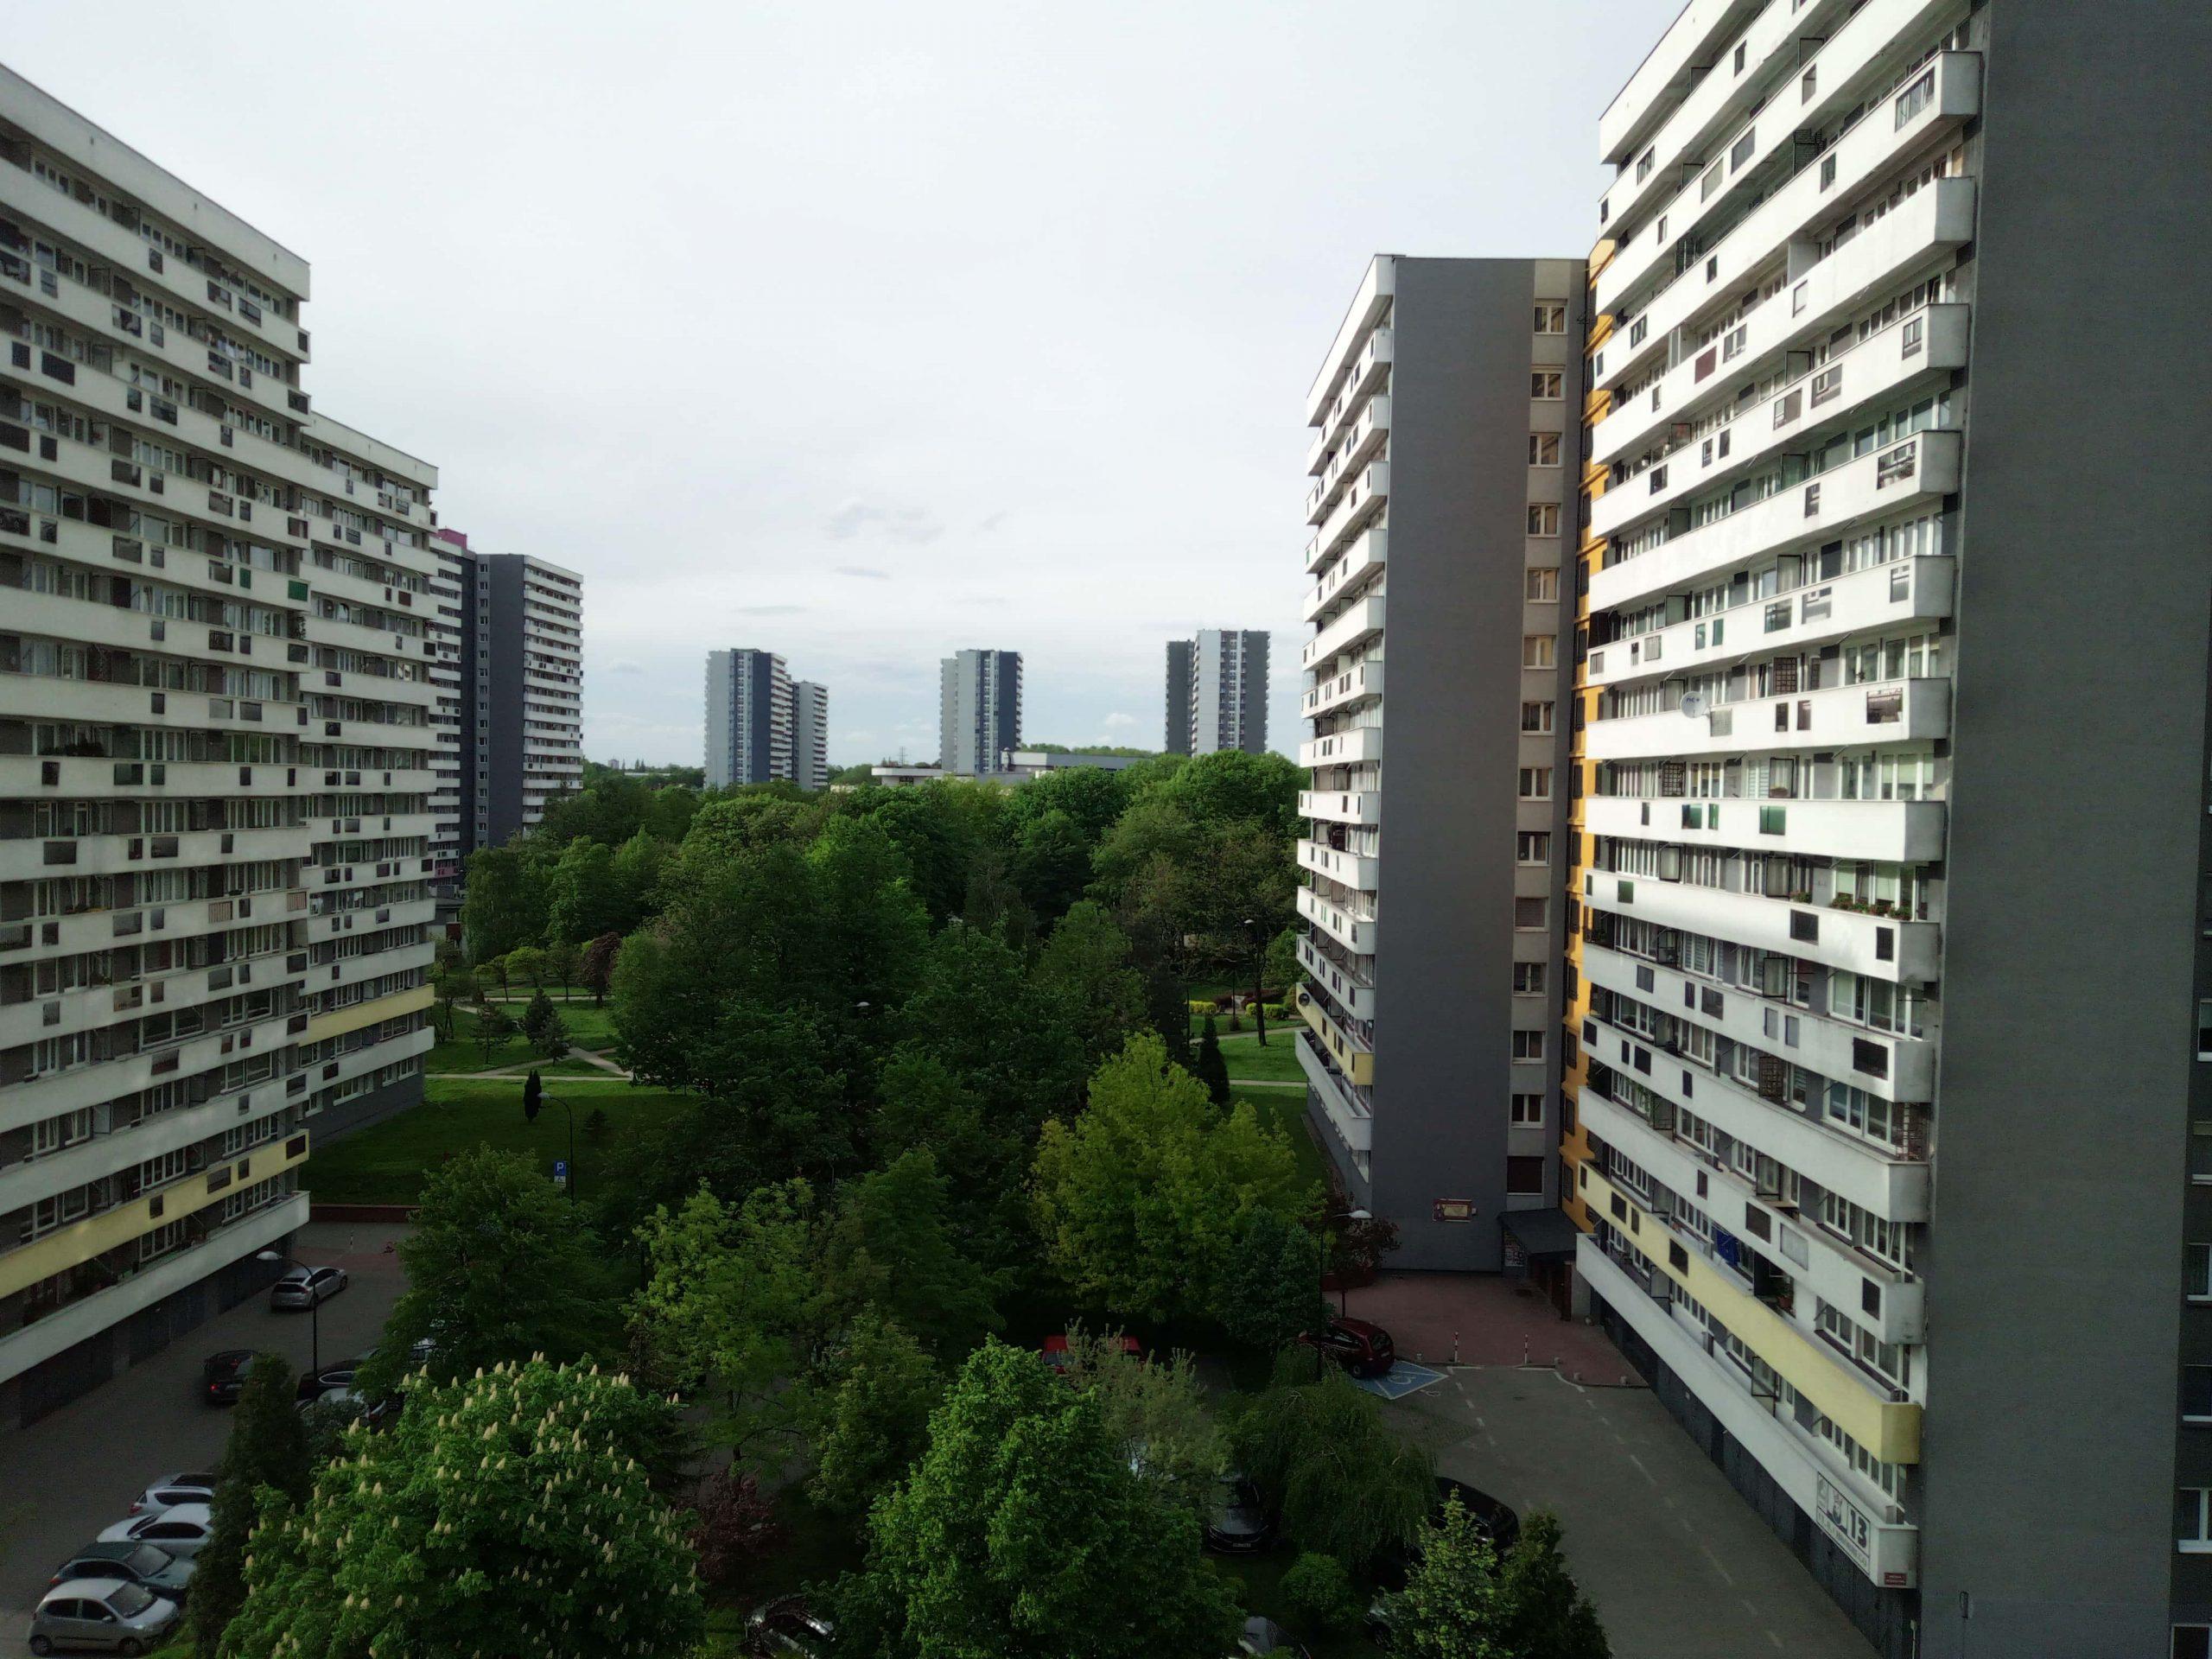 Pochmurna pogoda - Maxcom MS507